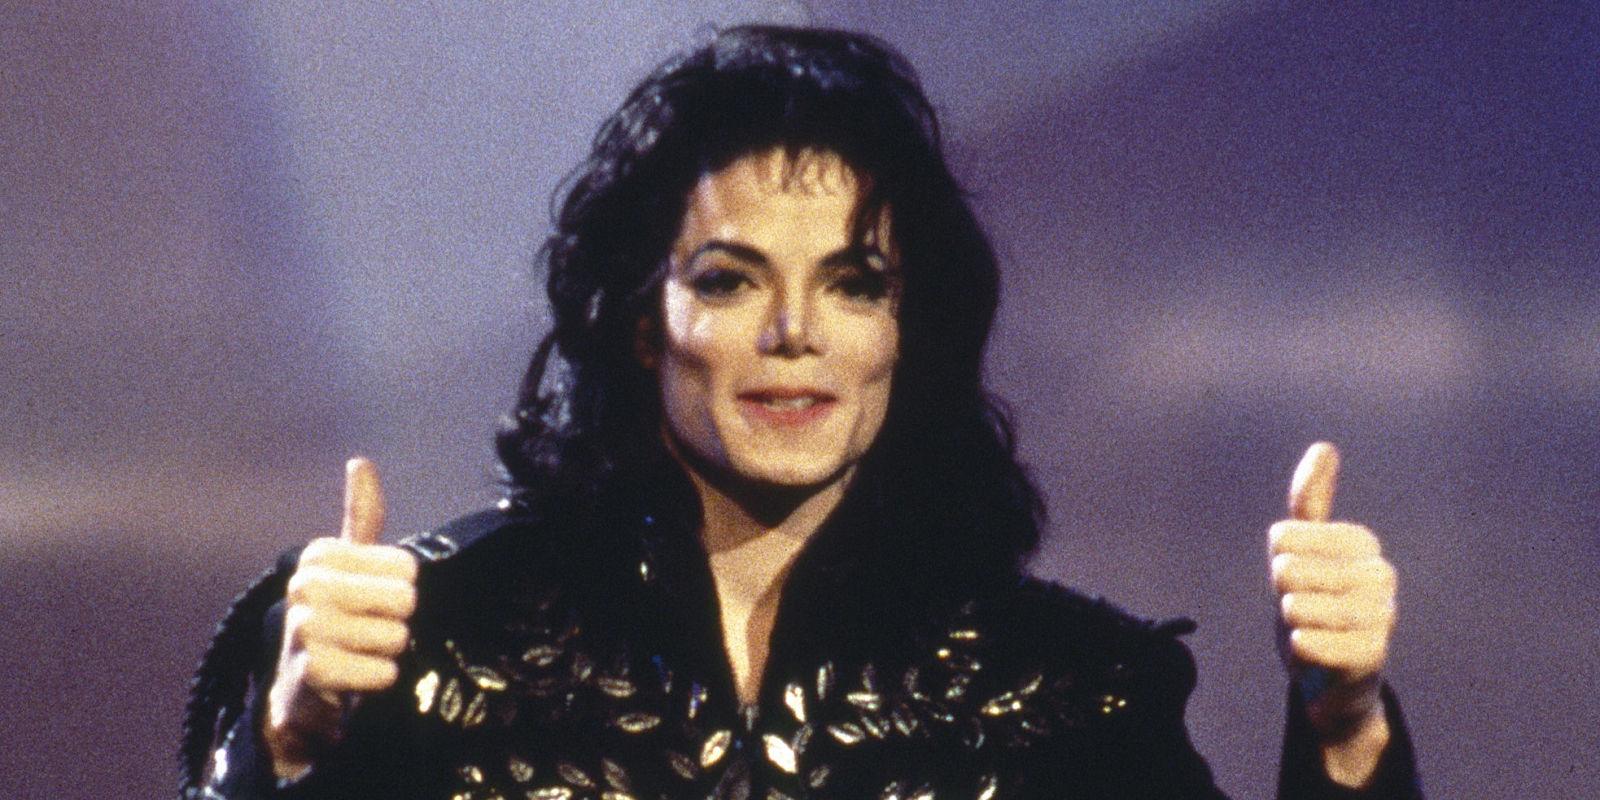 Michael jackson biography essay